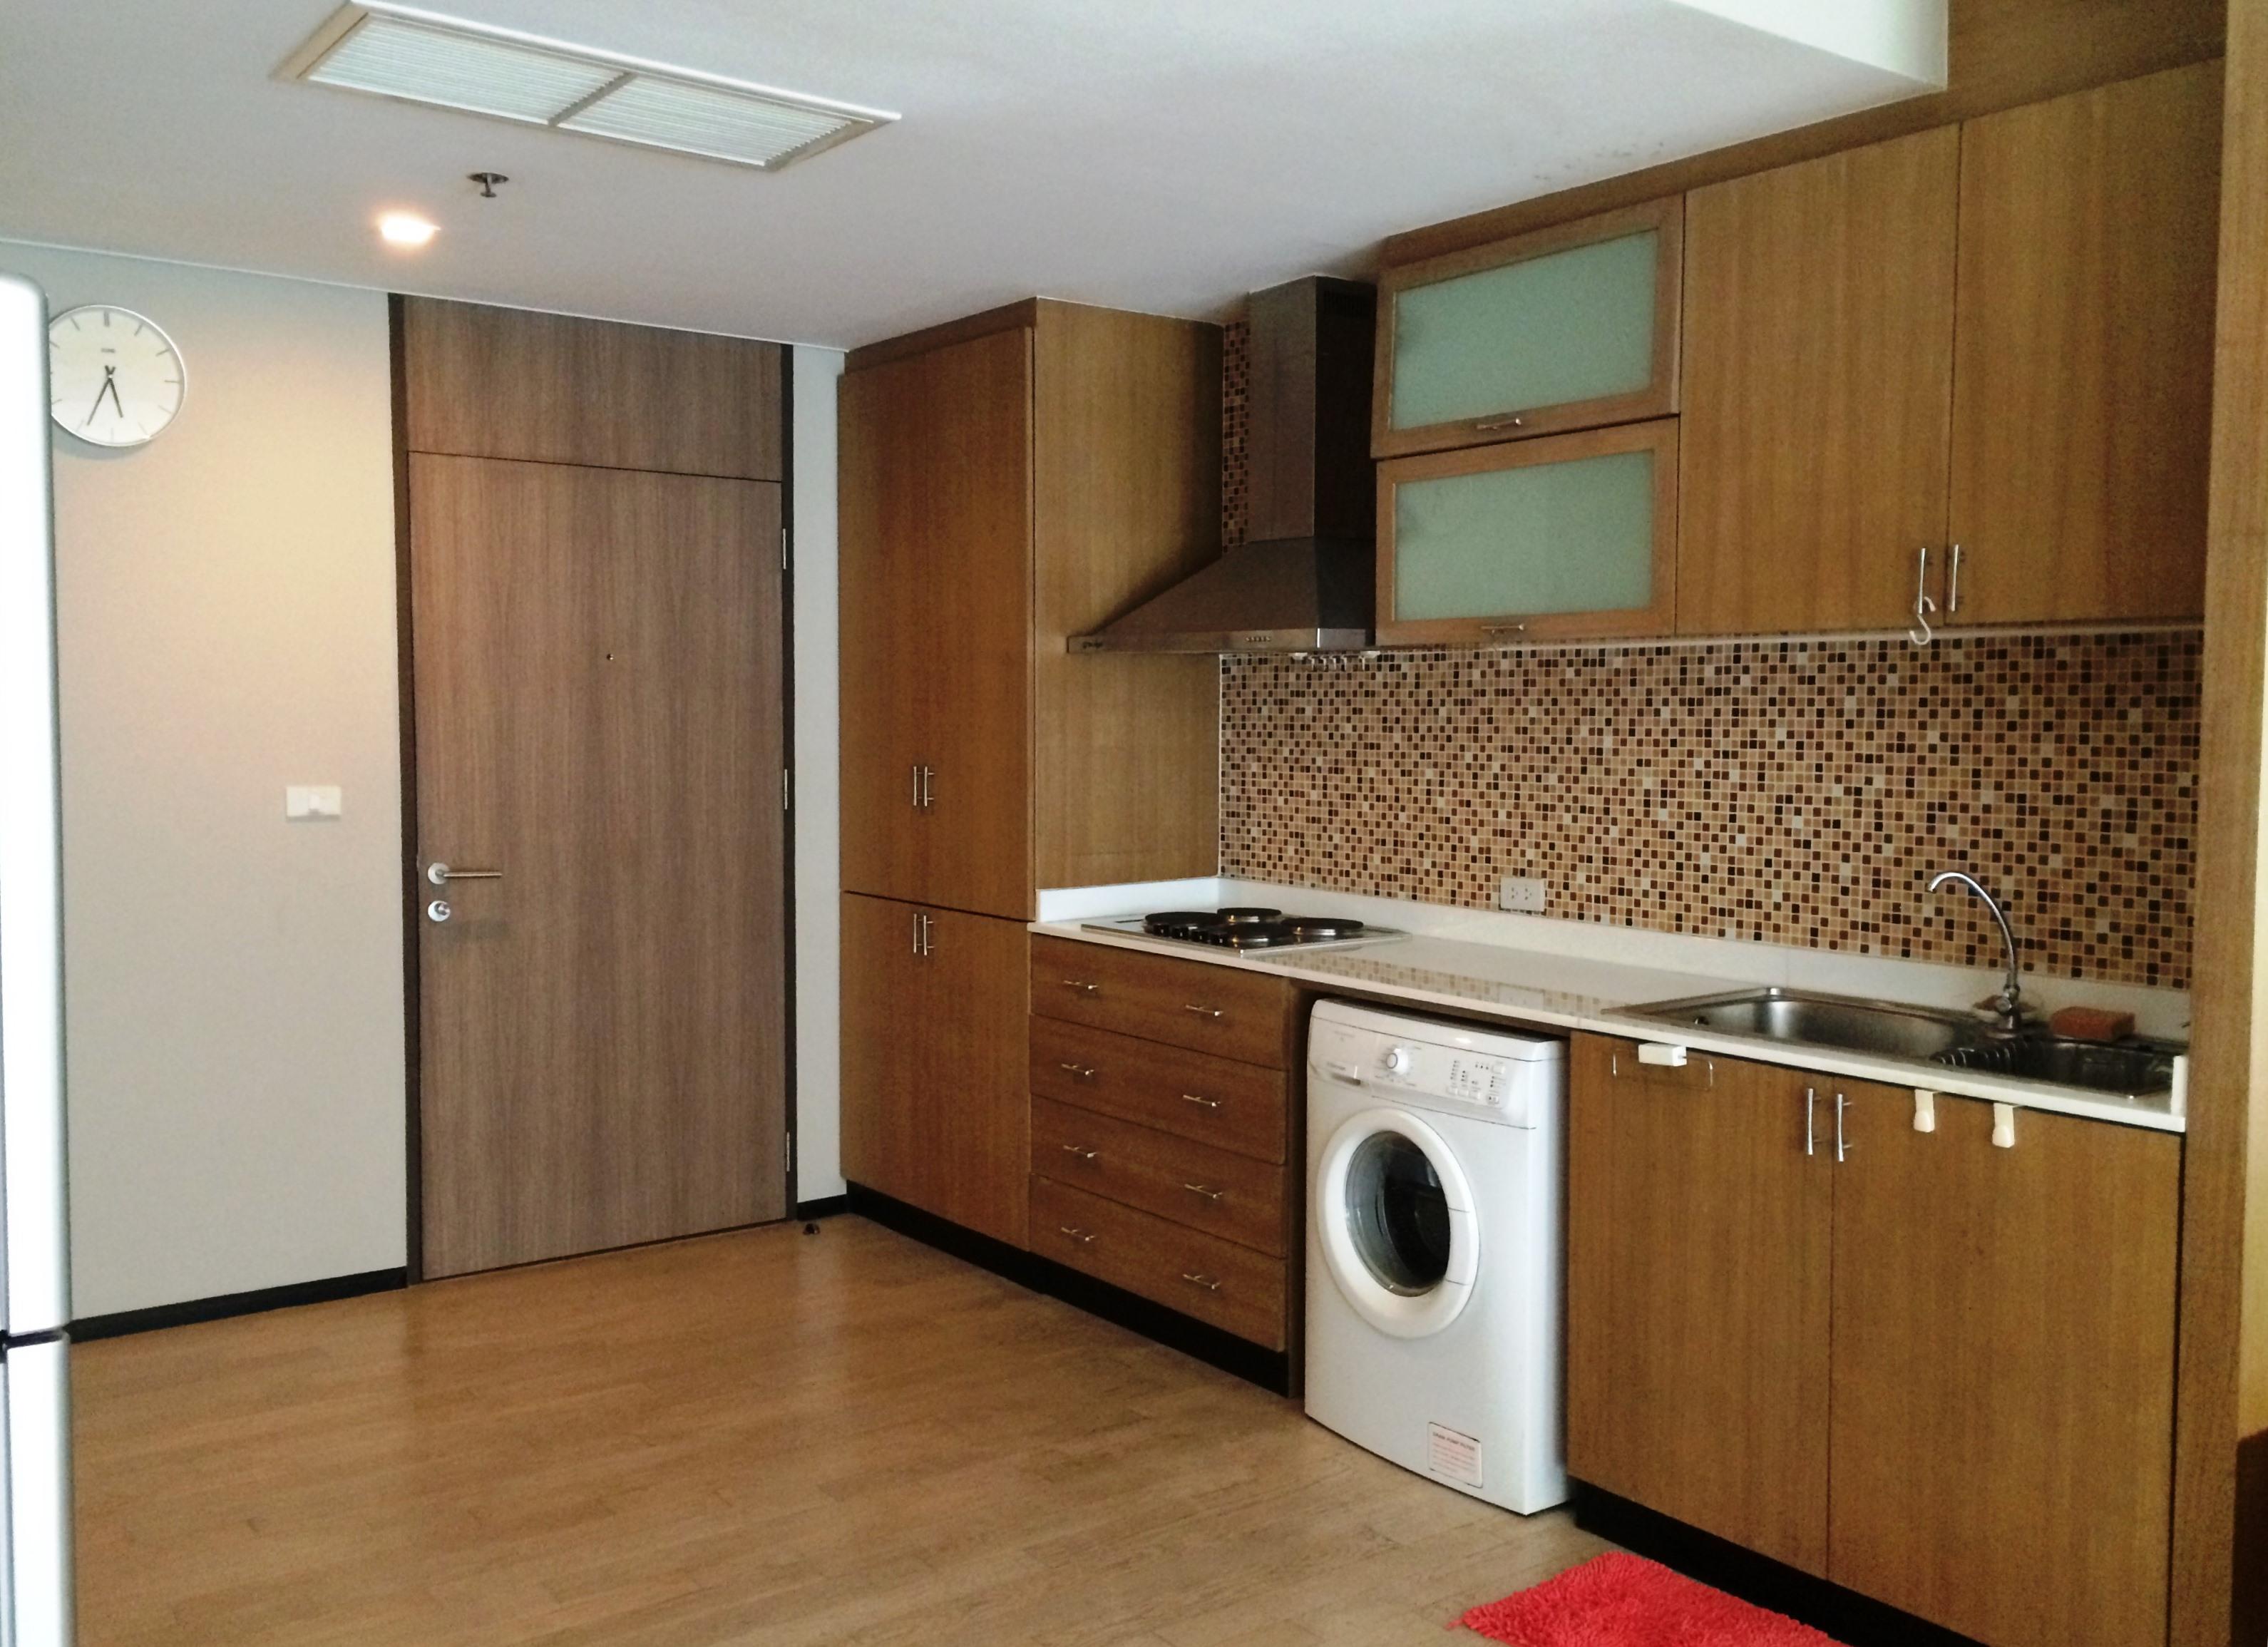 RE/MAX Properties Agency's Noble Remix, 2B/2B, High floor, BTS Thong Lo - sky walk access 5